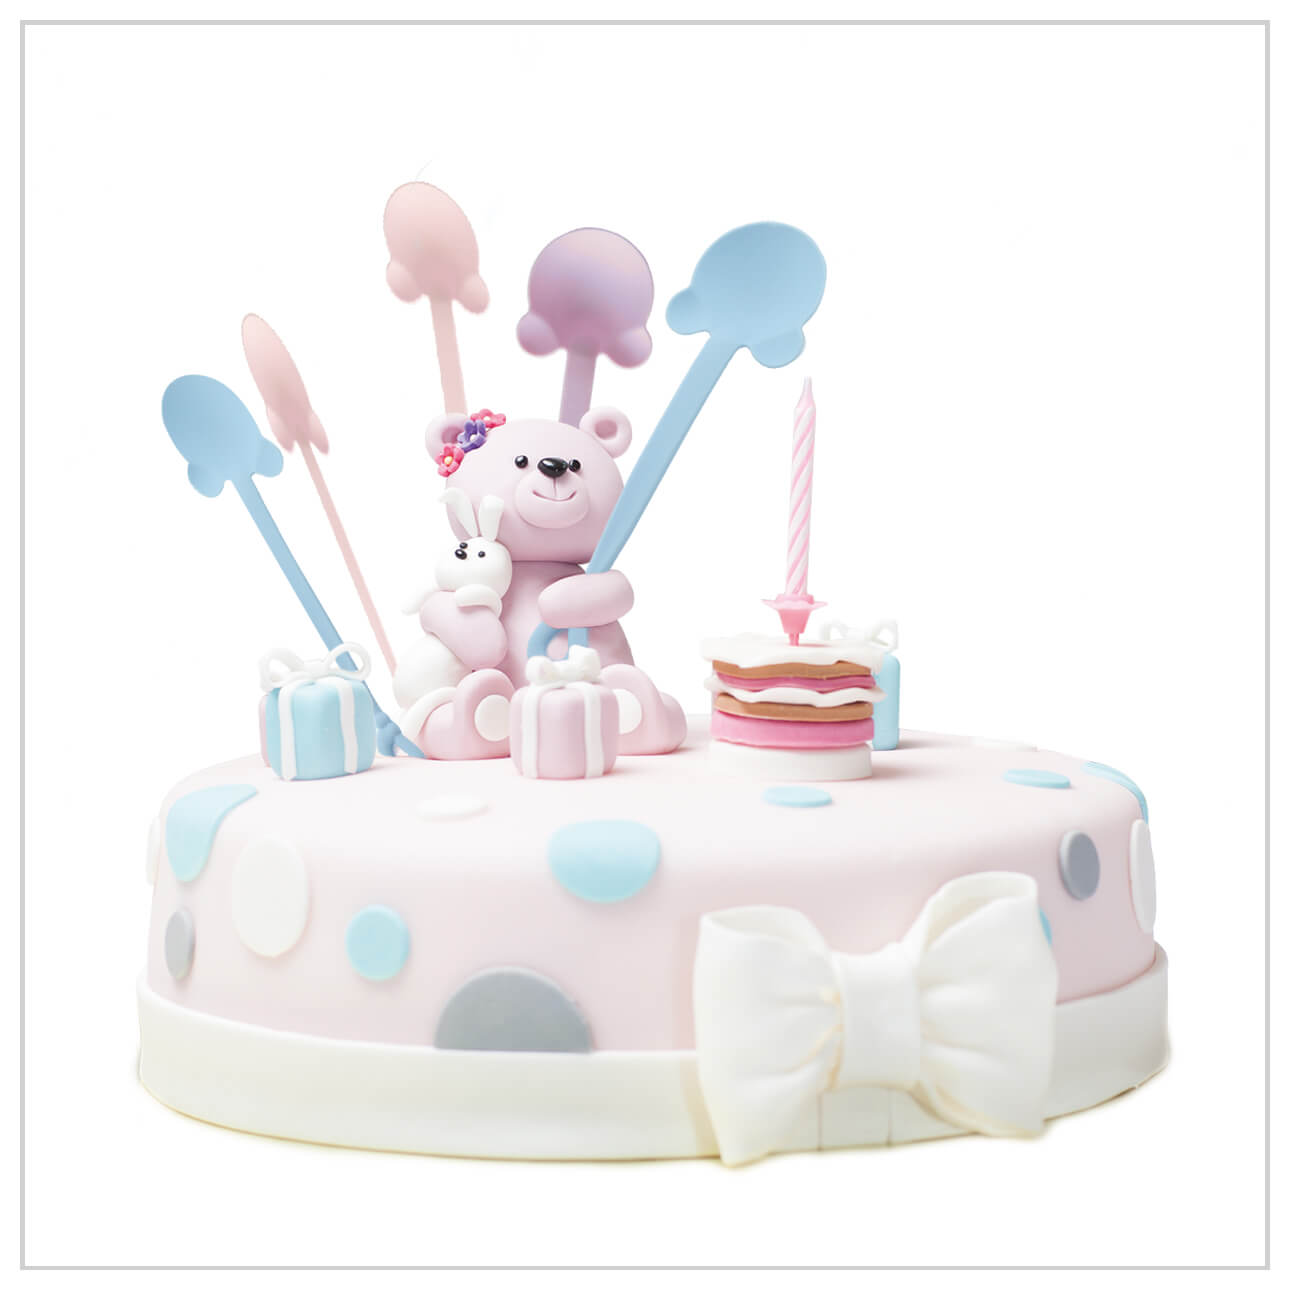 Cake Spoon - Cake Spoon